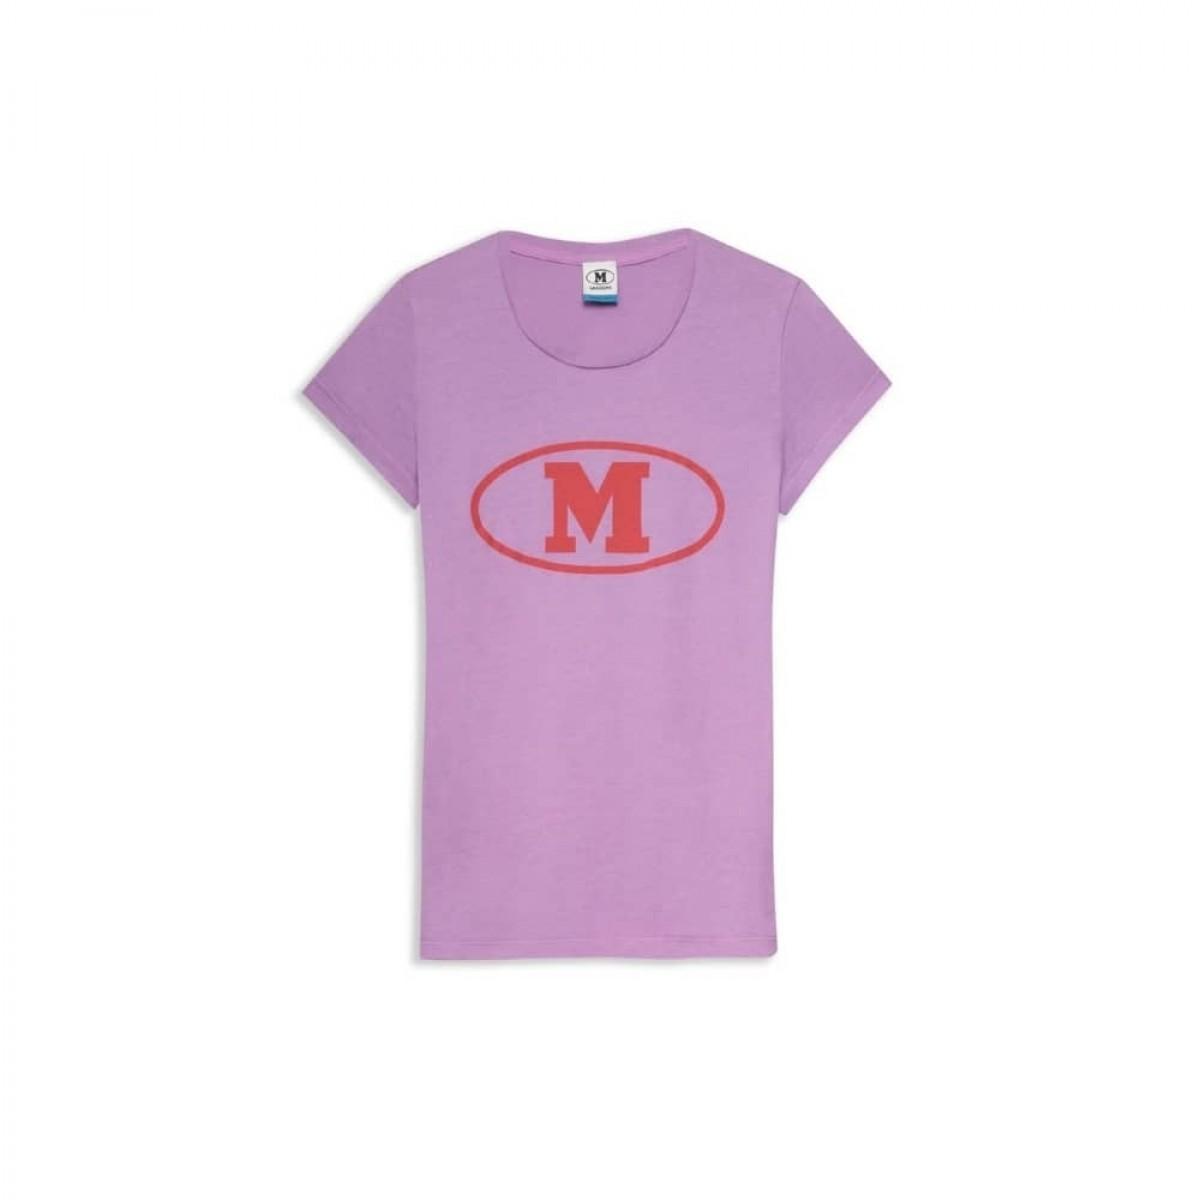 m missoni t-shirt - purple - front